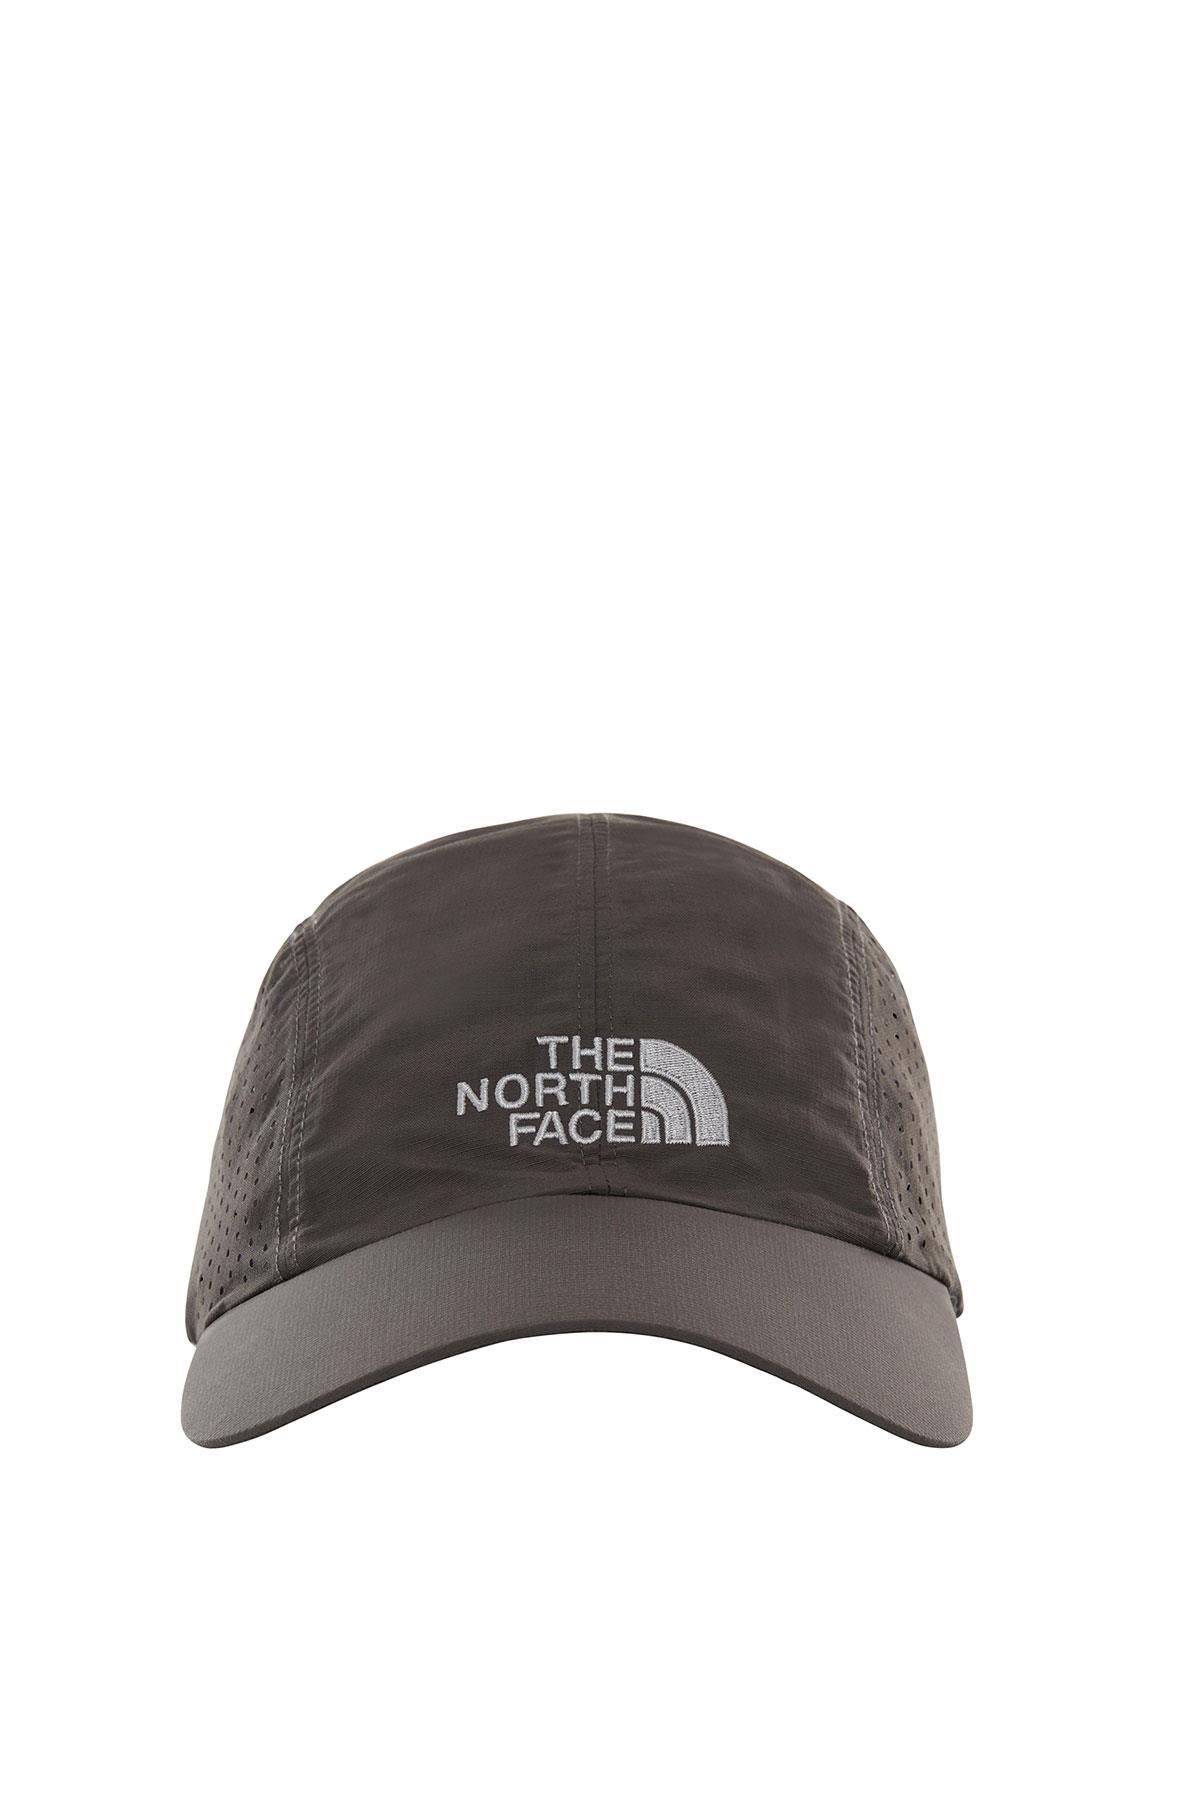 The Northface Sun Shield Ball Cap T92Satagb